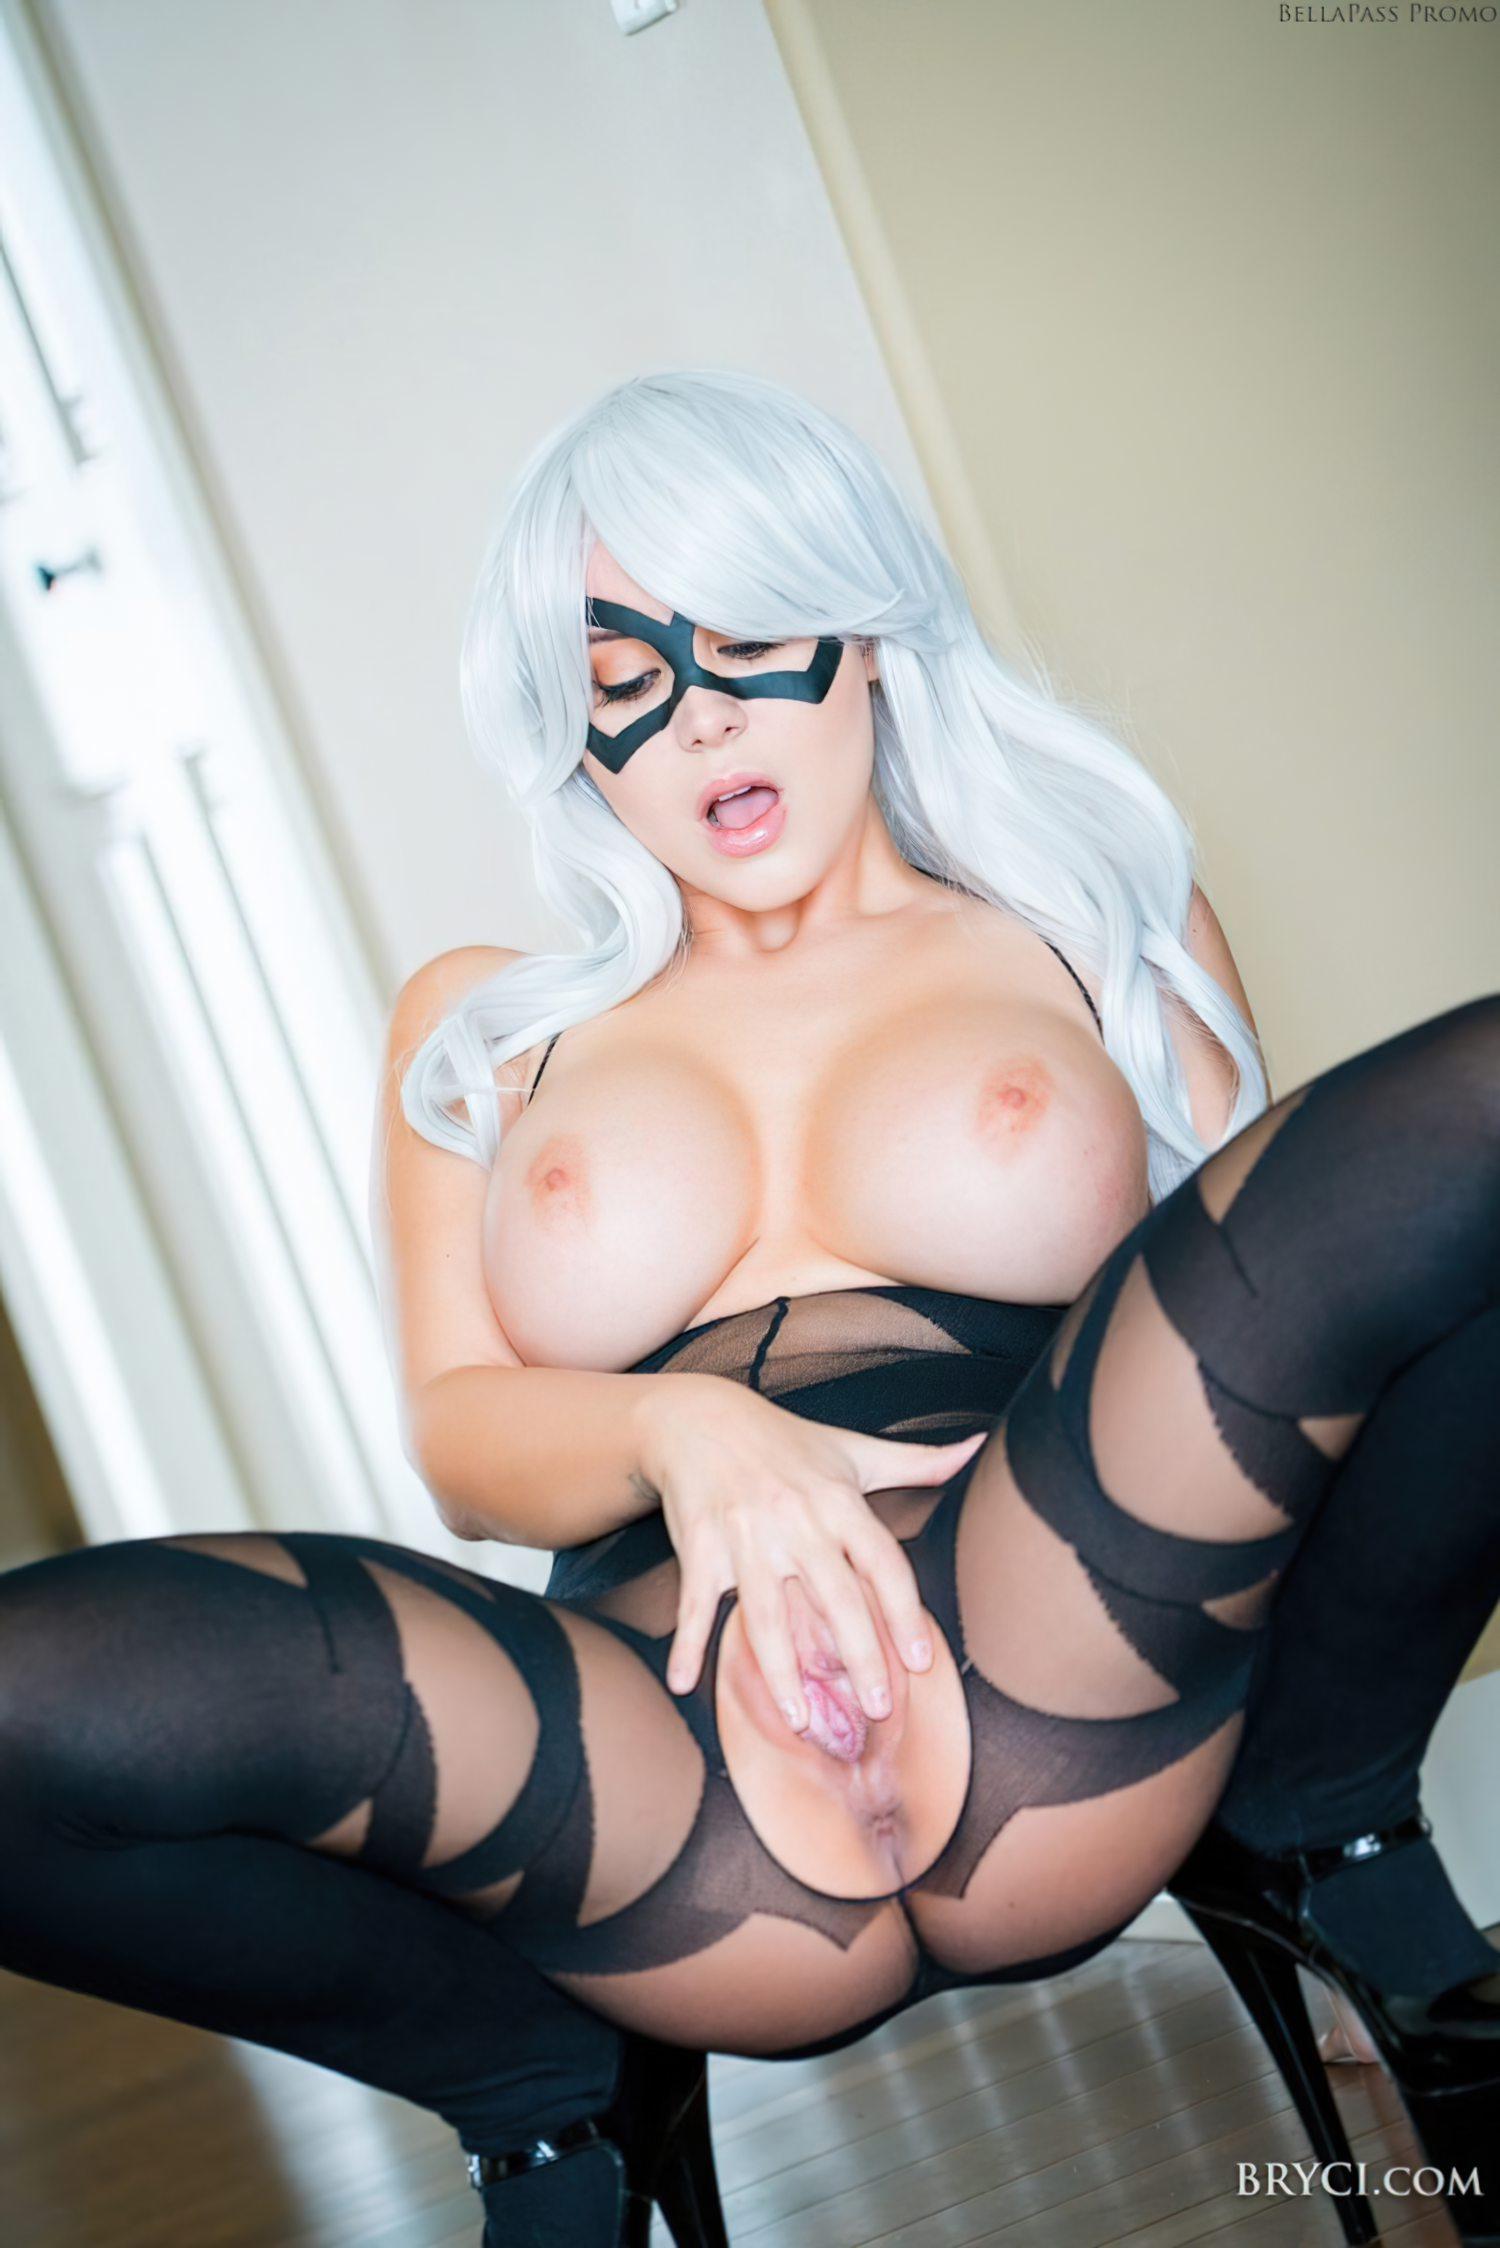 Bryci Catwoman Nua (9)